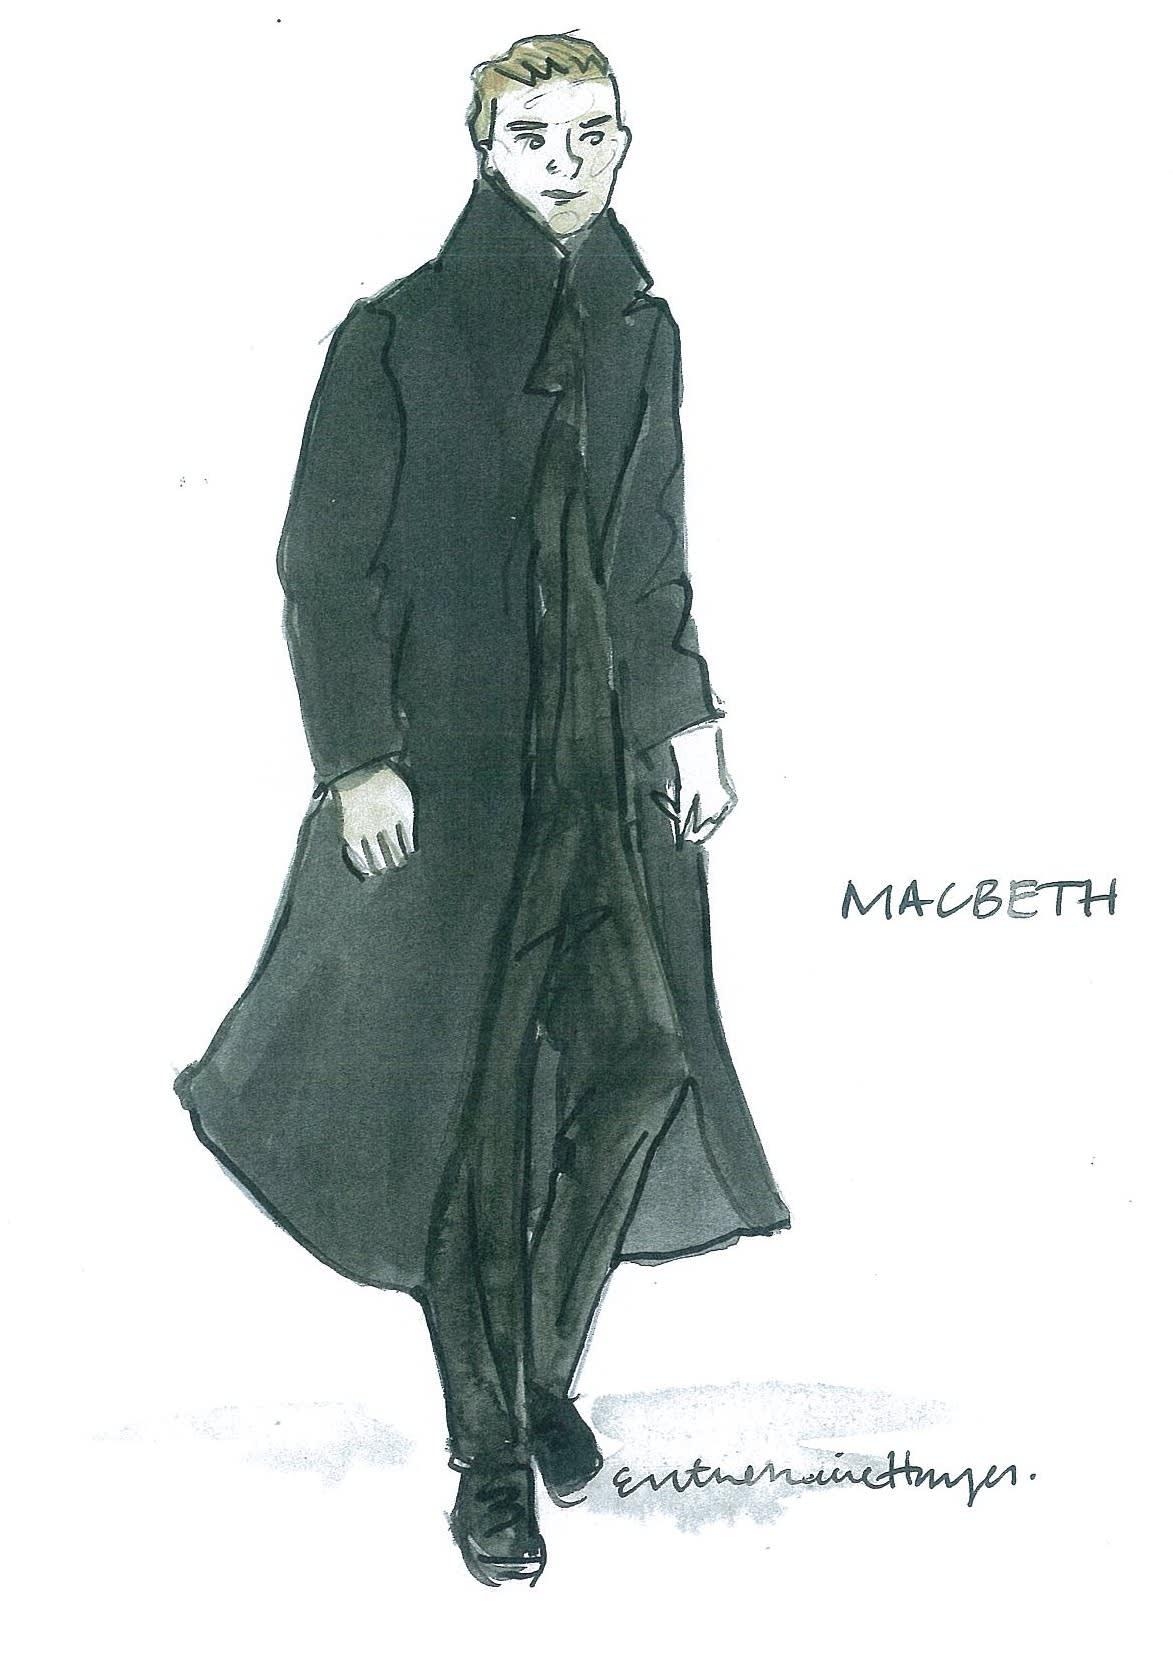 Macbeth_coat.jpg